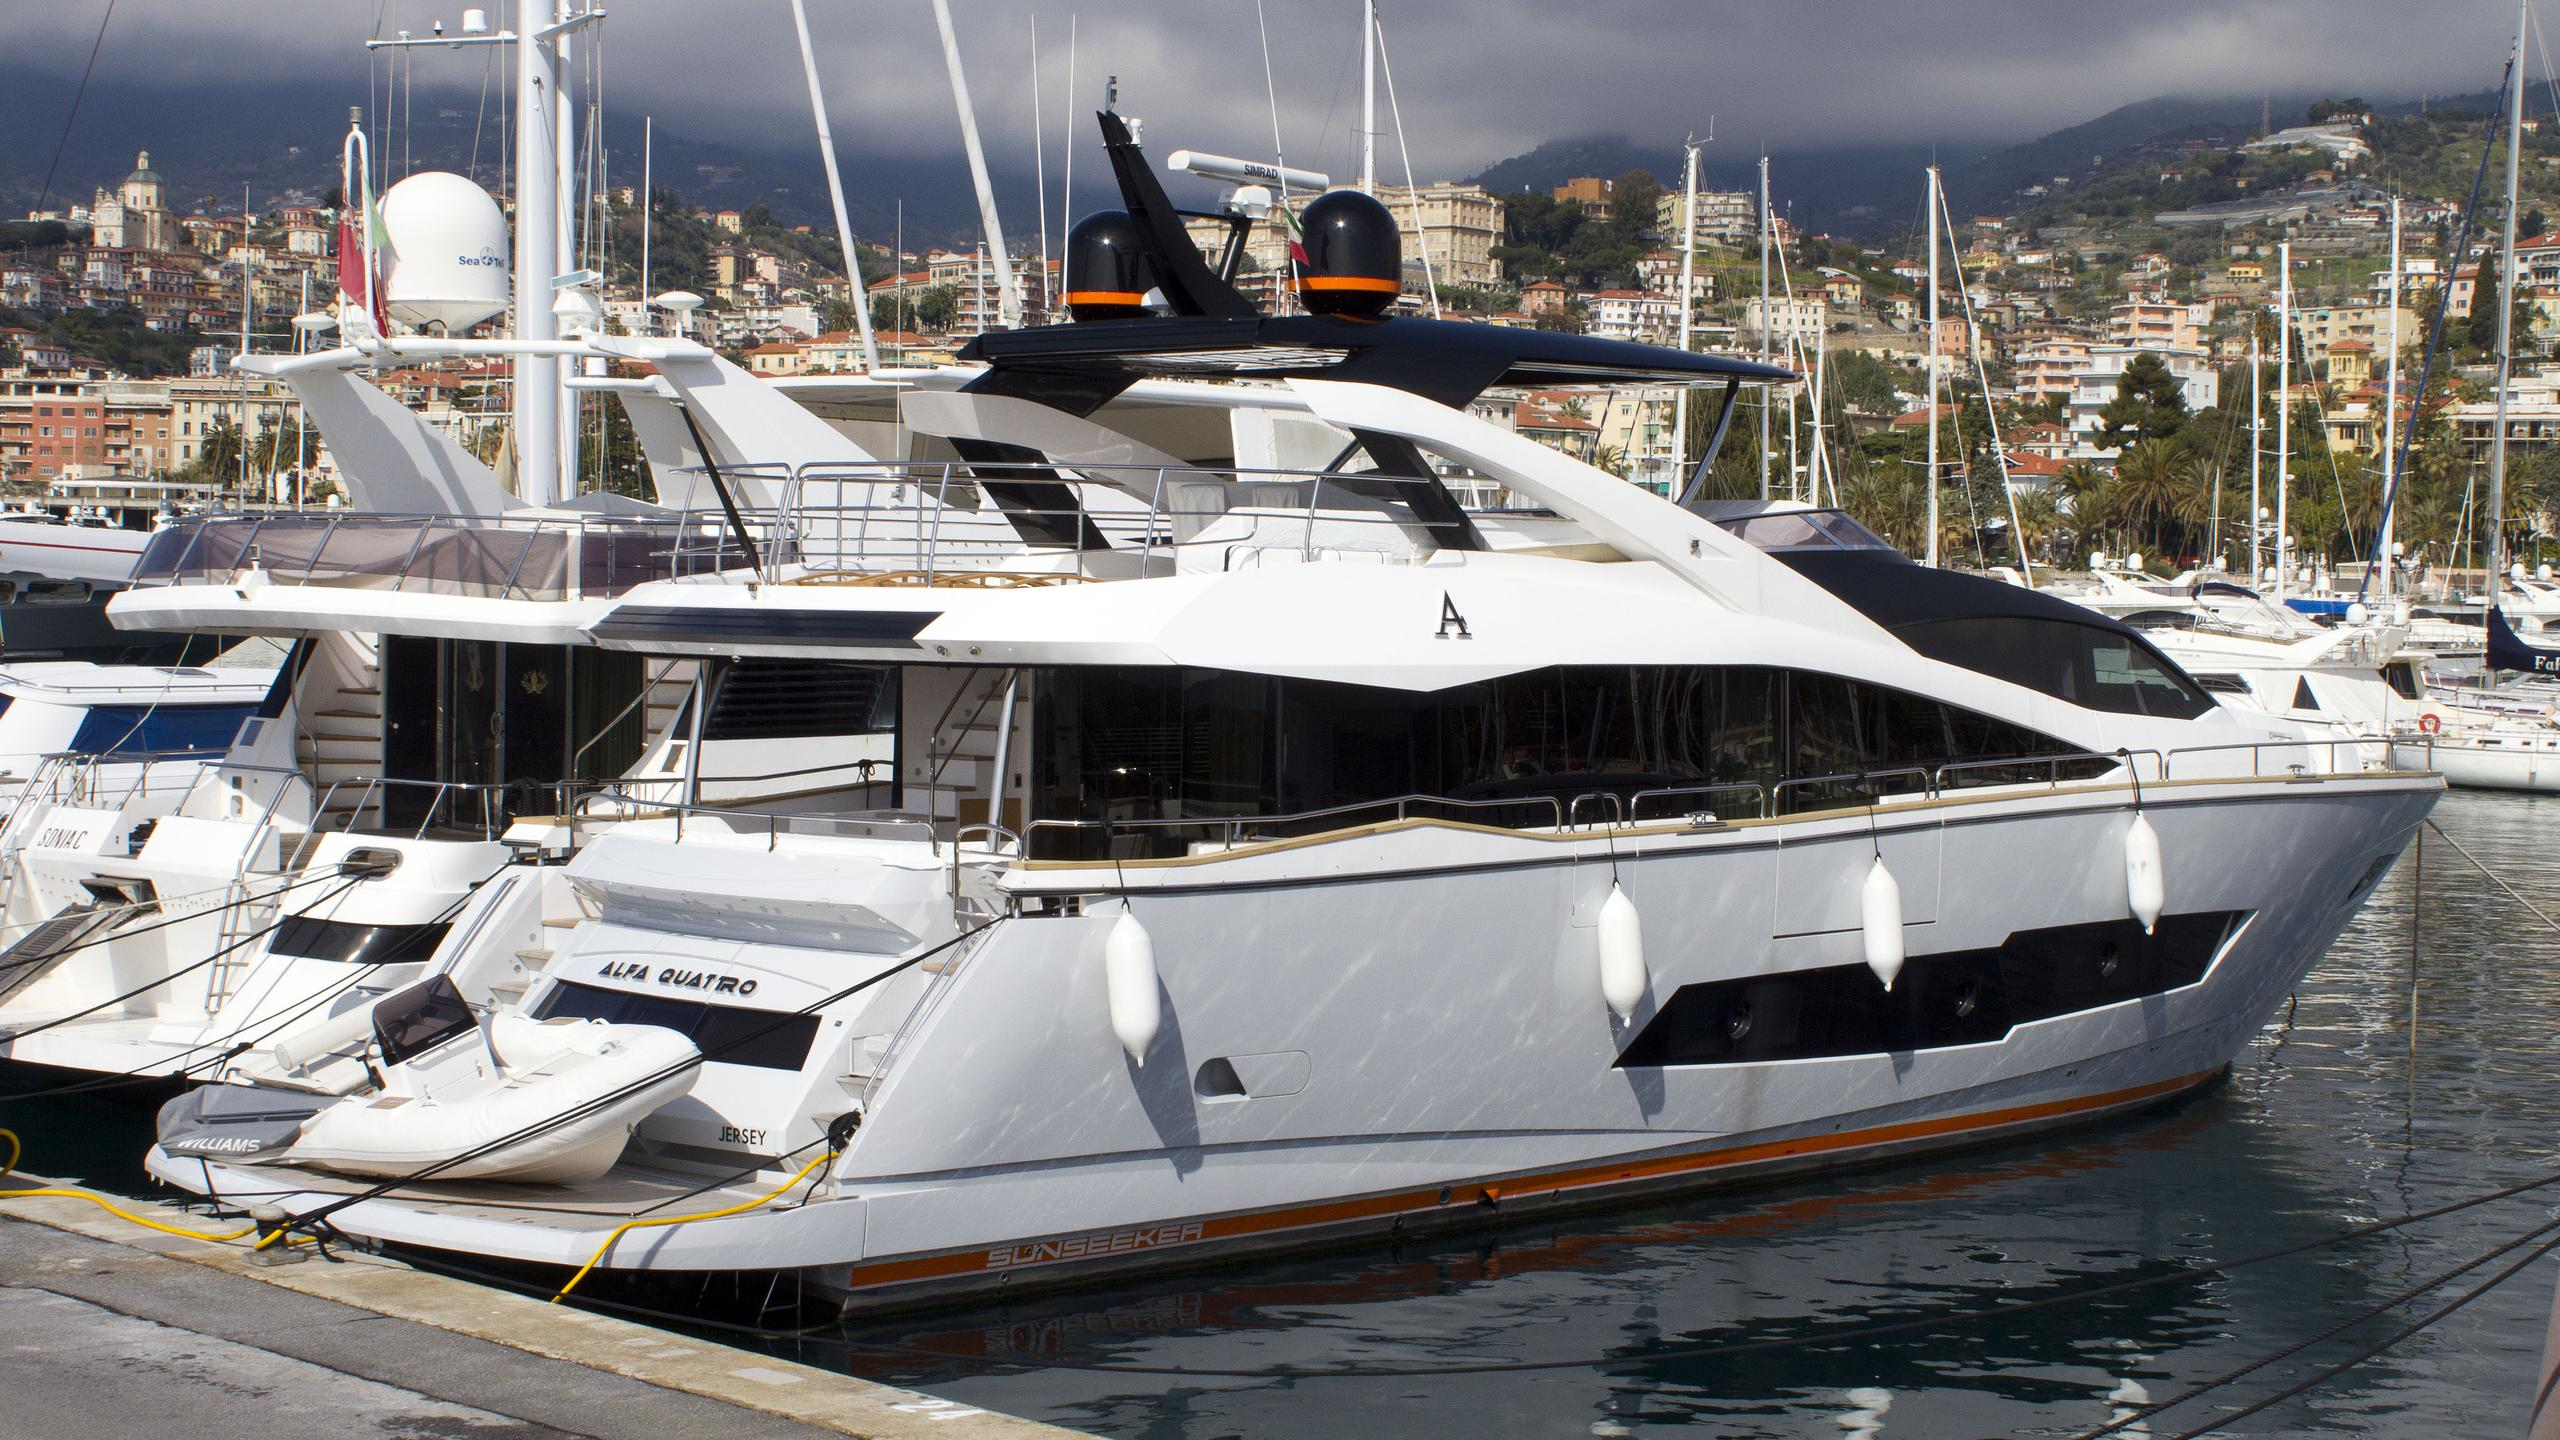 alfa-quattro-motor-yacht-sunseeker-28m-2015-stern